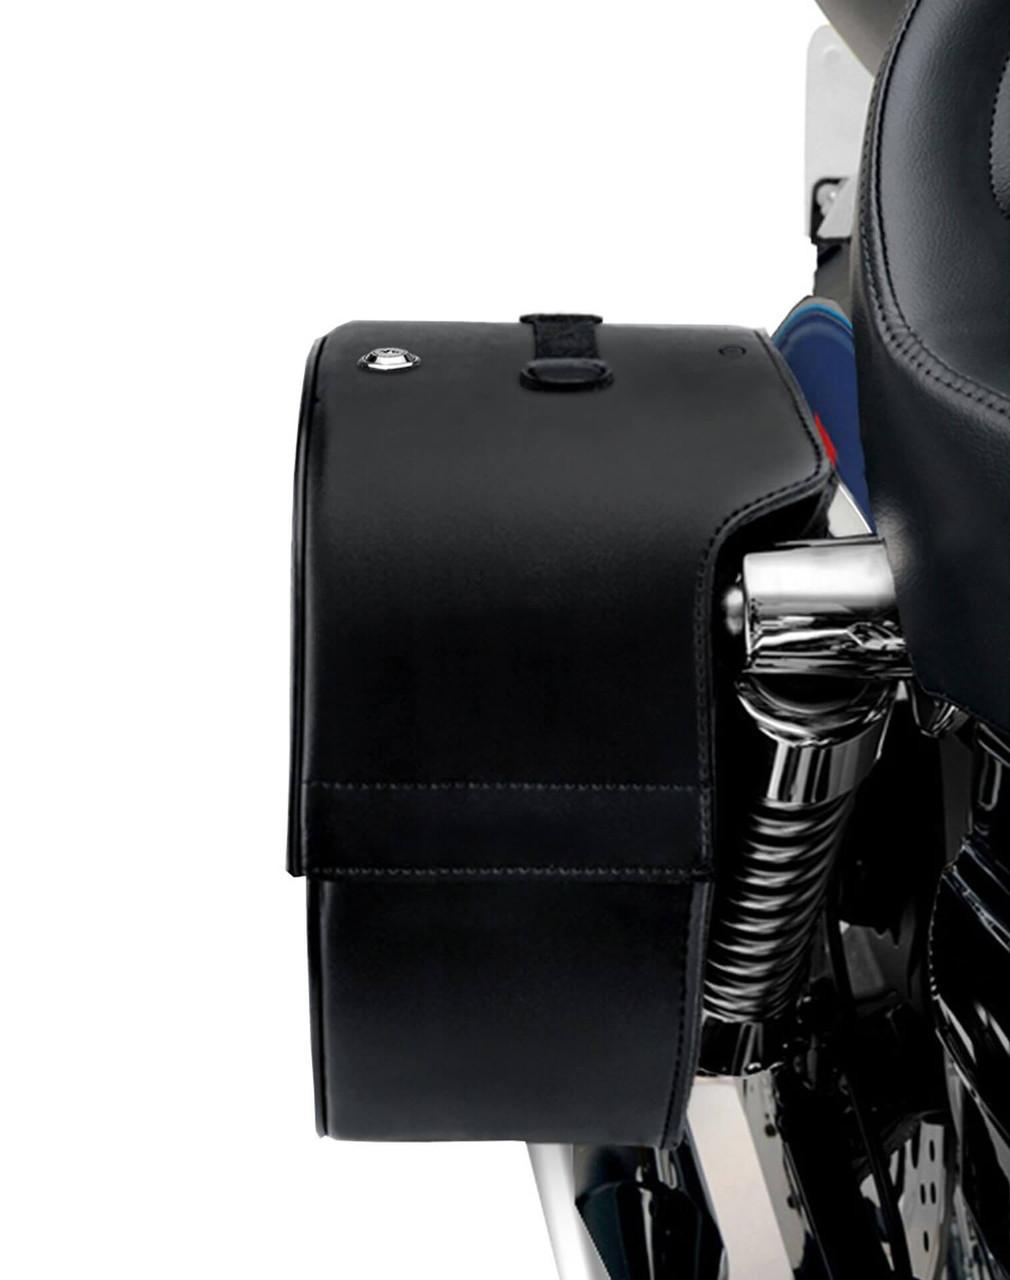 Kawasaki 1600 Mean Streak Spear Shock Cutout Studded Large Motorcycle Saddlebags Shock Cutout View